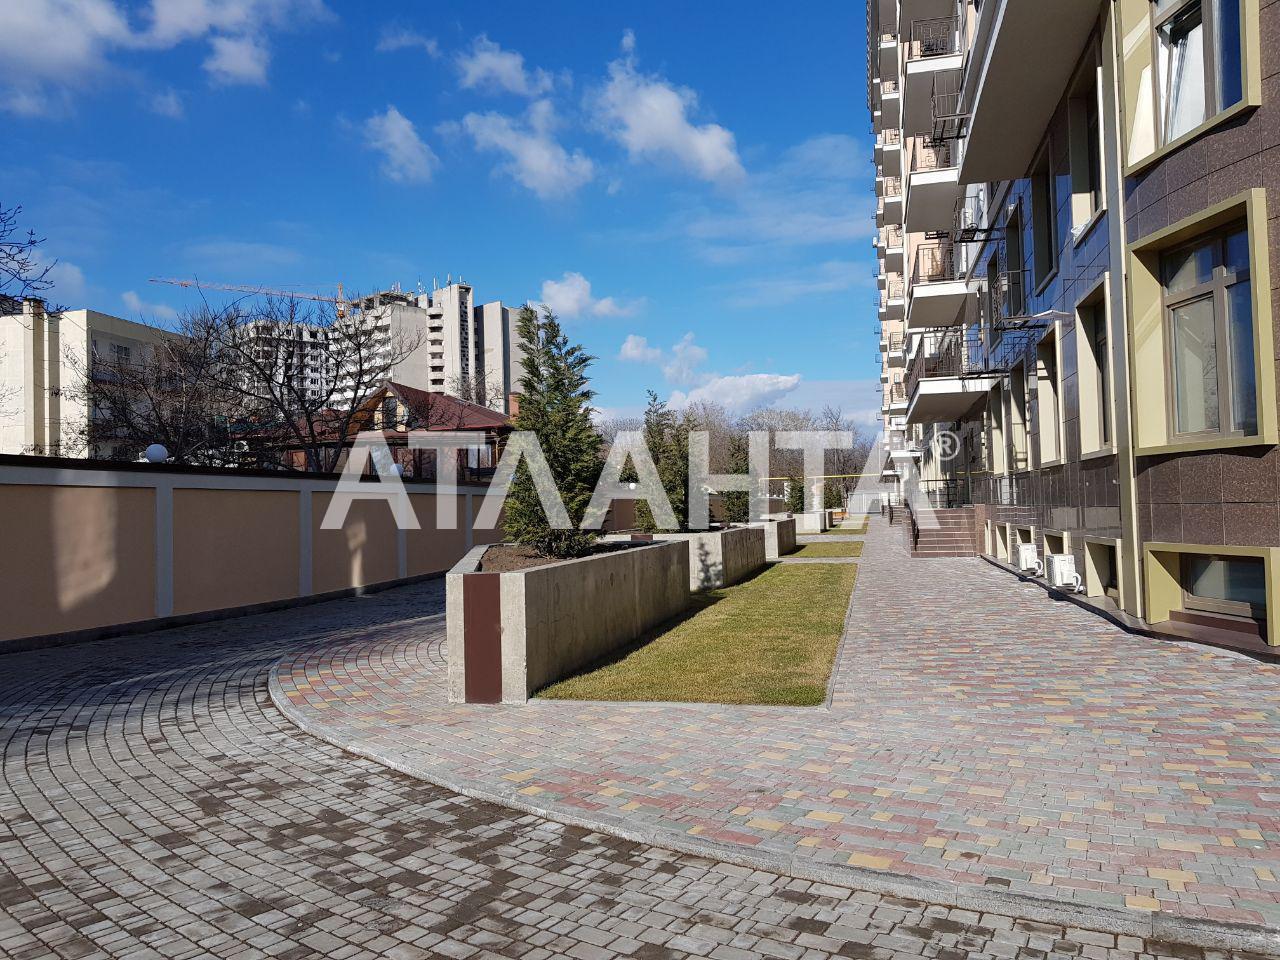 Продается 3-комнатная Квартира на ул. Литературная — 100 000 у.е. (фото №4)